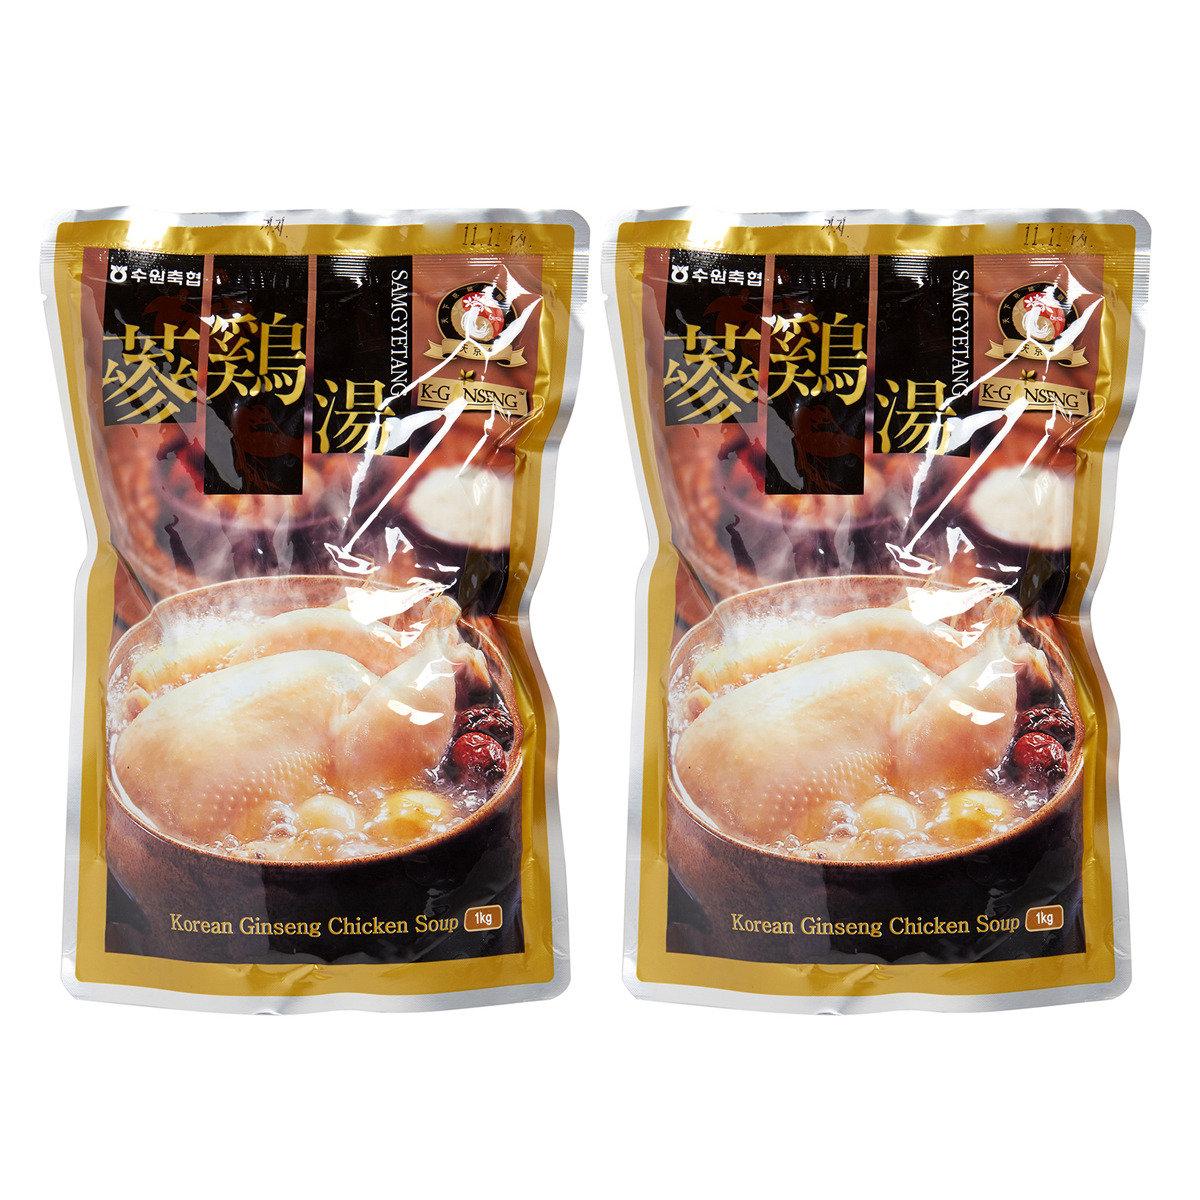 蔘雞湯 1kg*2packs